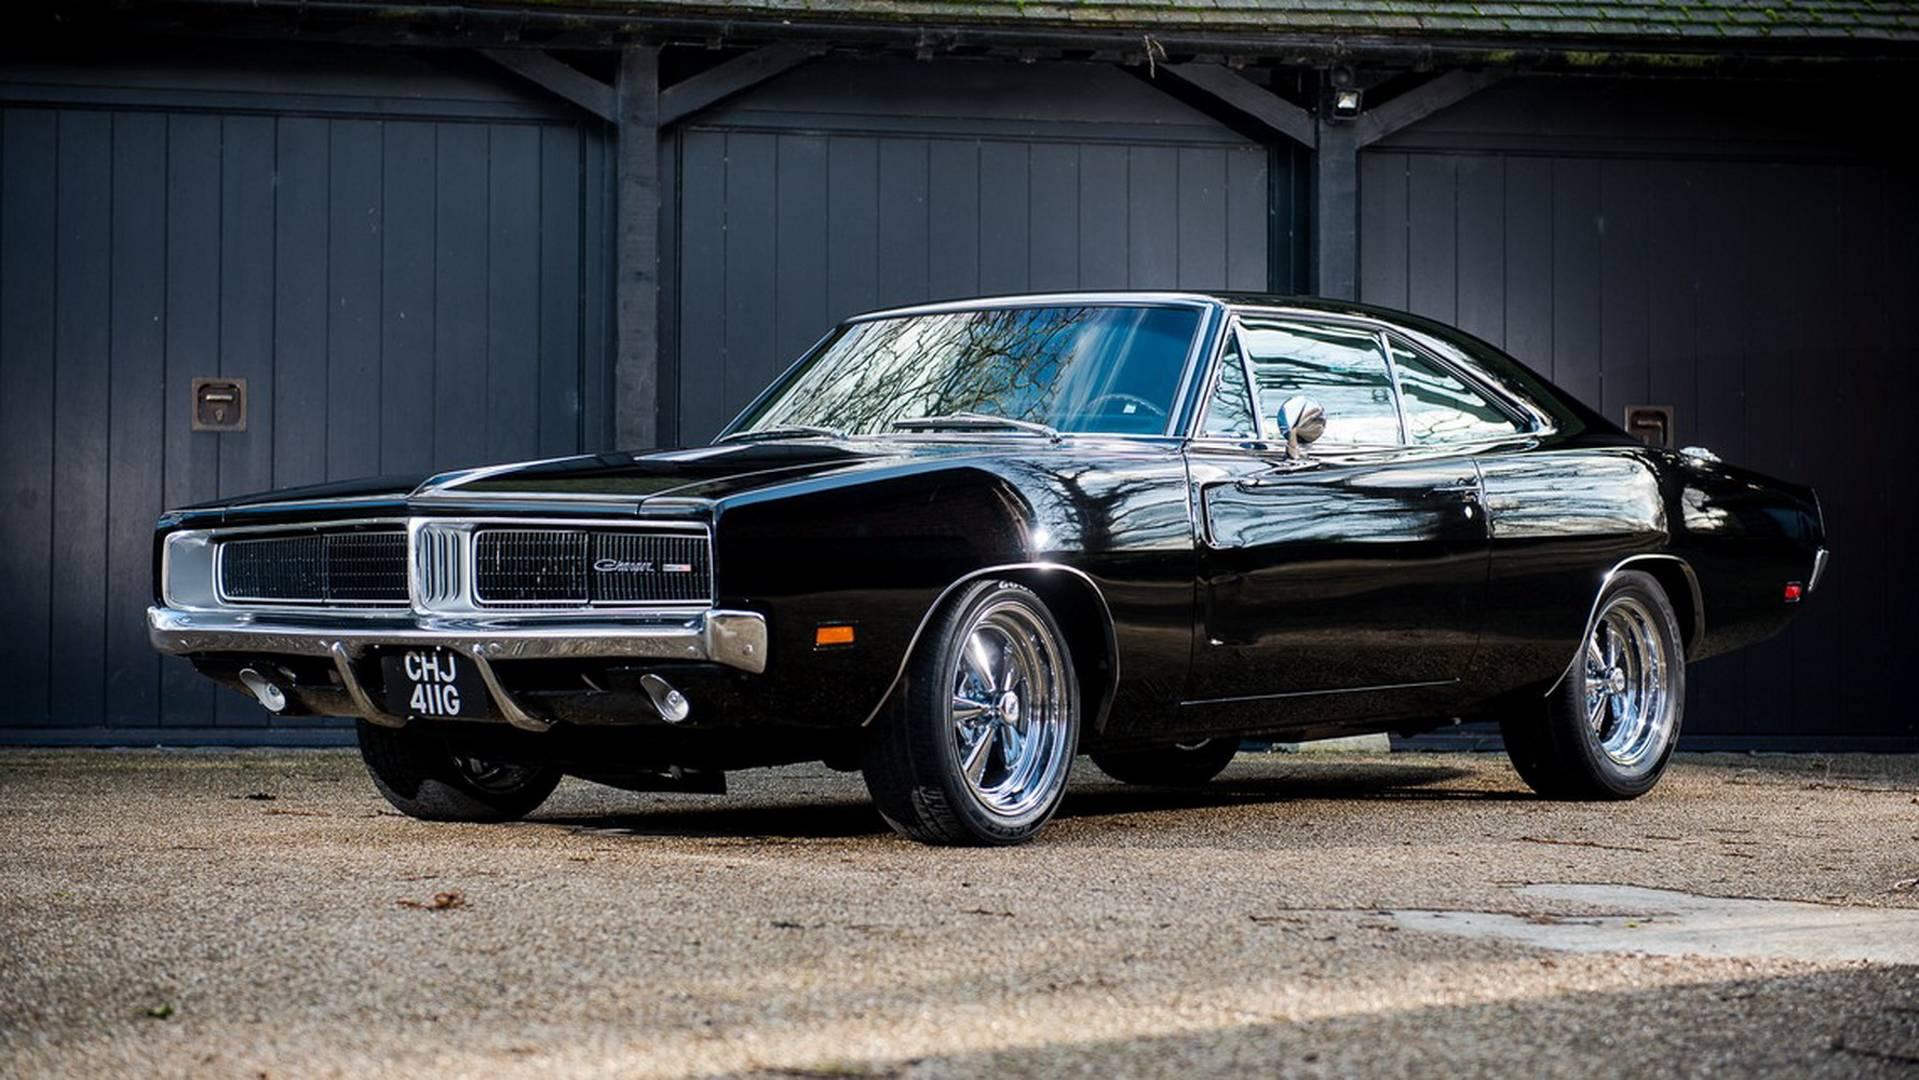 Dodge Charger 1969 Que Foi De Bruce Willis Vai A Leilao